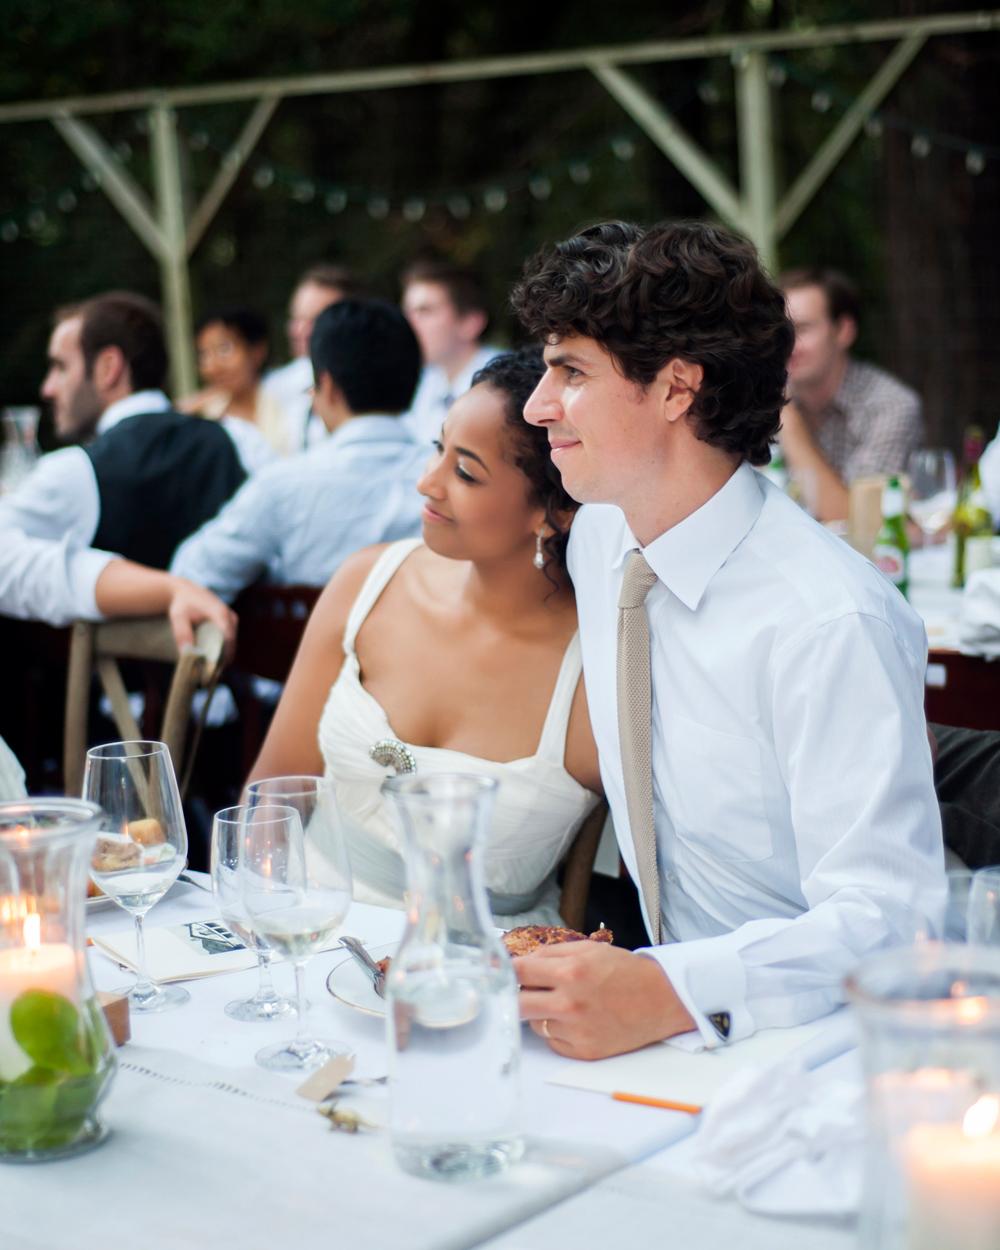 ralston-white-retreat-mill-valley-wedding-photography-lilouette-67.jpg